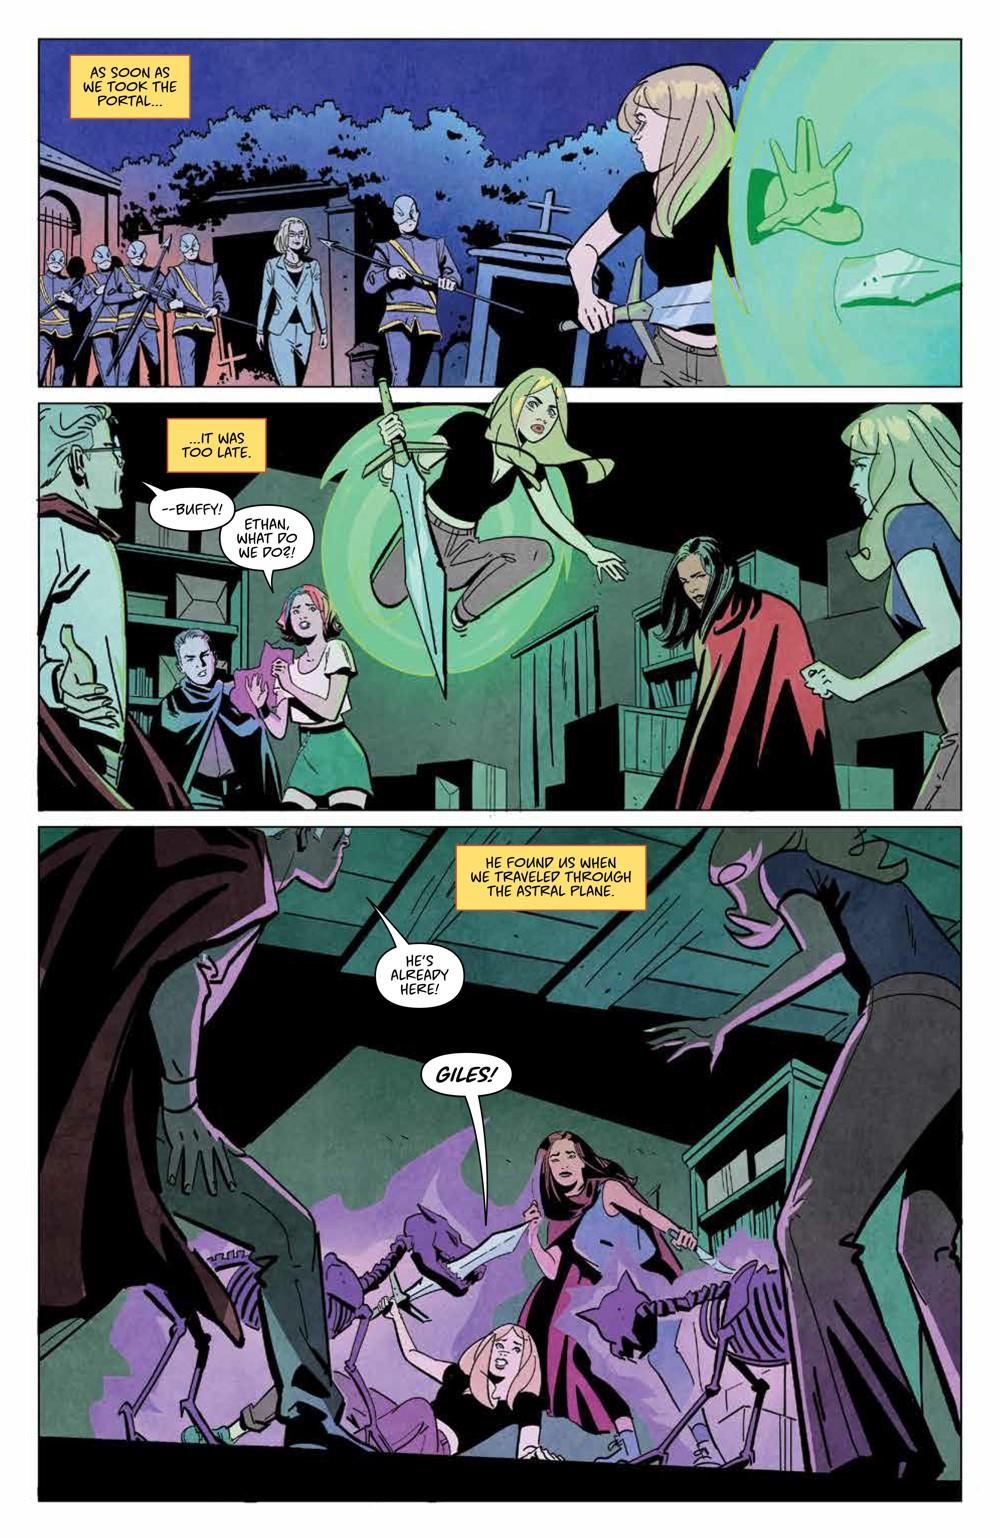 Buffy_030_PRESS_3 ComicList Previews: BUFFY THE VAMPIRE SLAYER #30